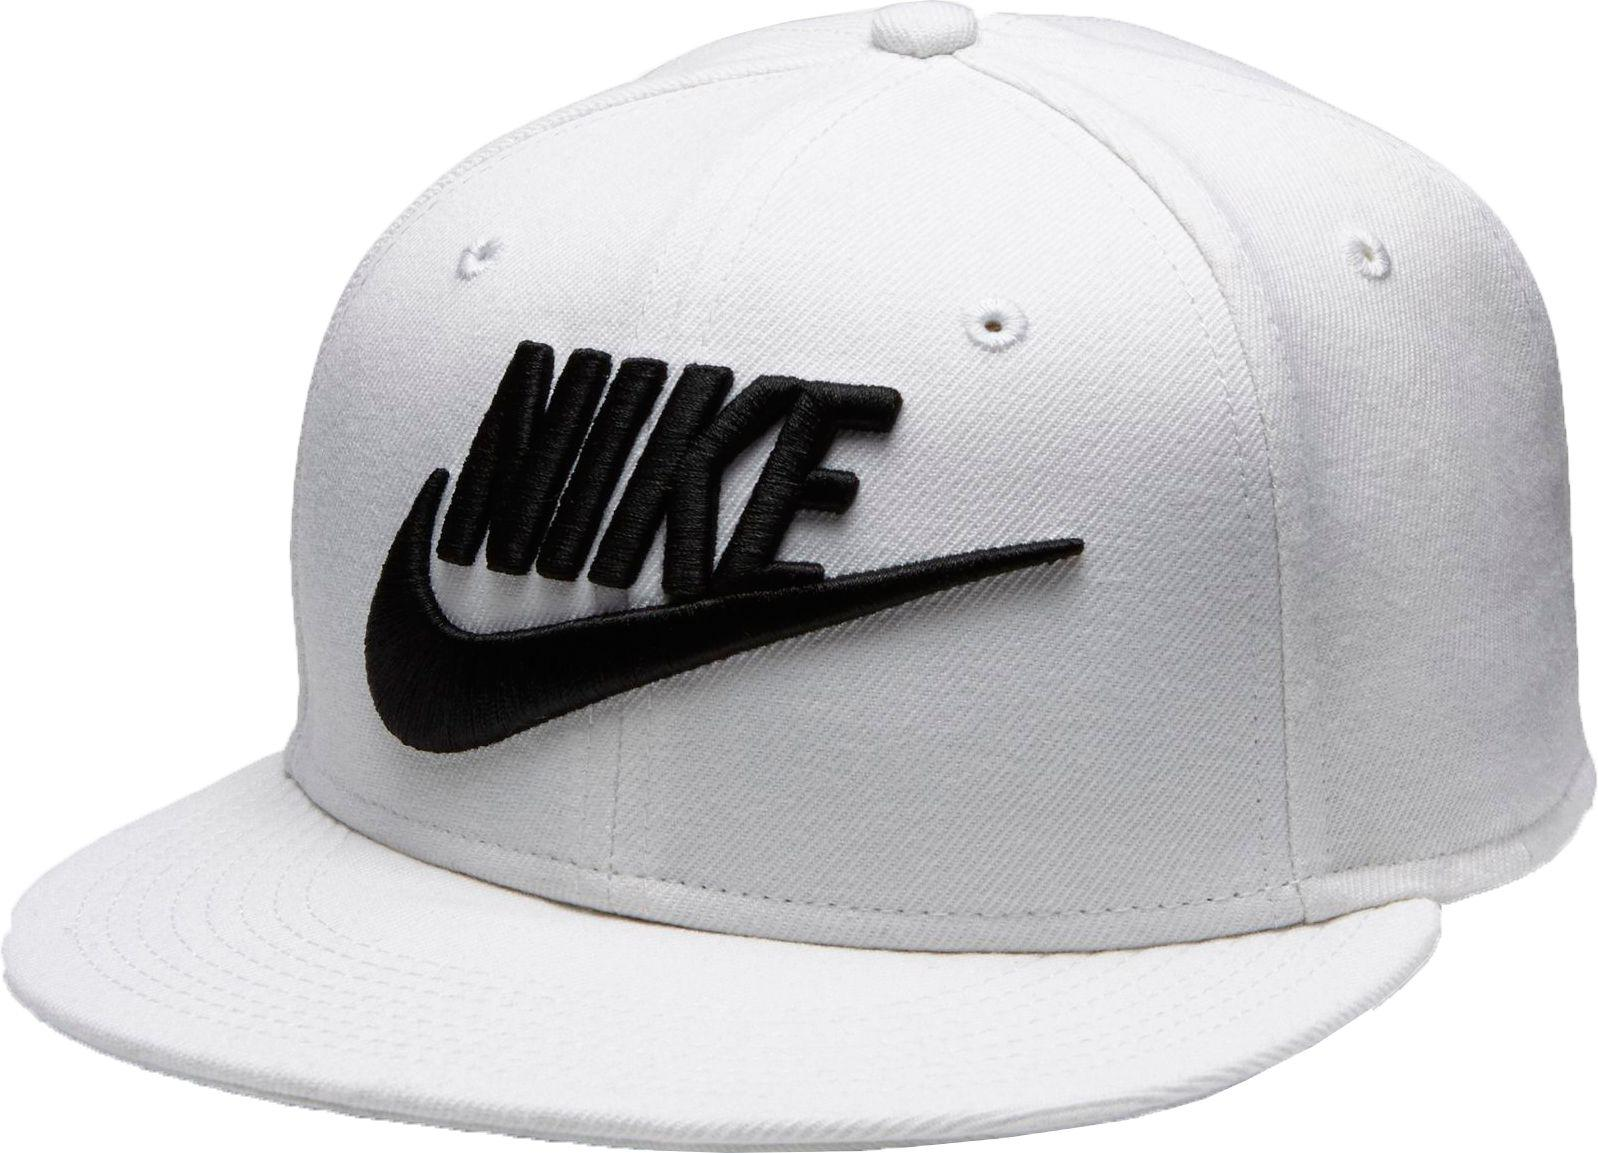 d76ad9d2 Lyst - Nike Futura True 2 Snapback Hat in White for Men